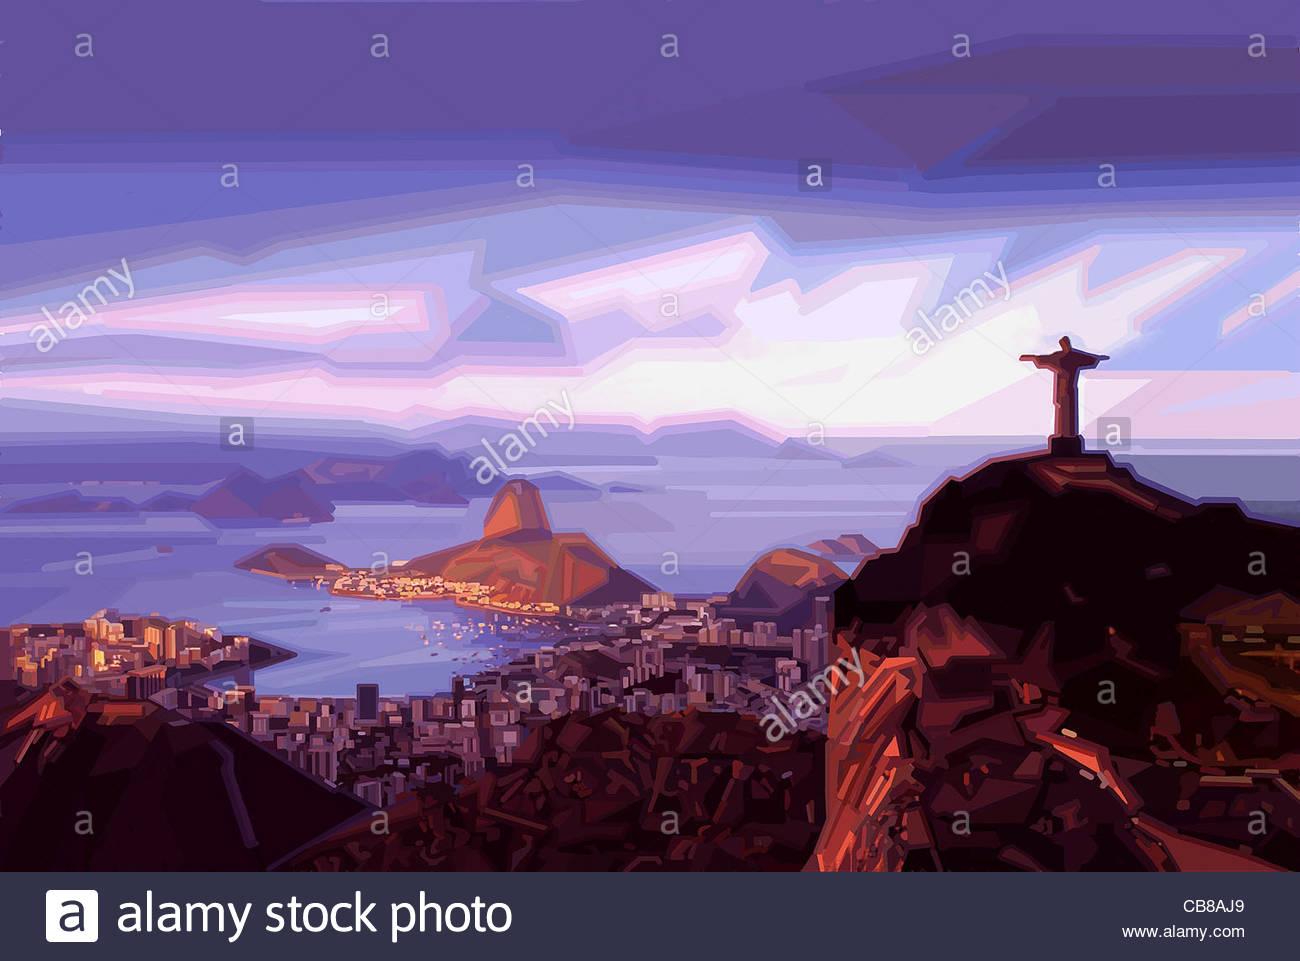 Series City Rio de Janeiro Carnival City urban urbanity Cities city city In Stock Photo